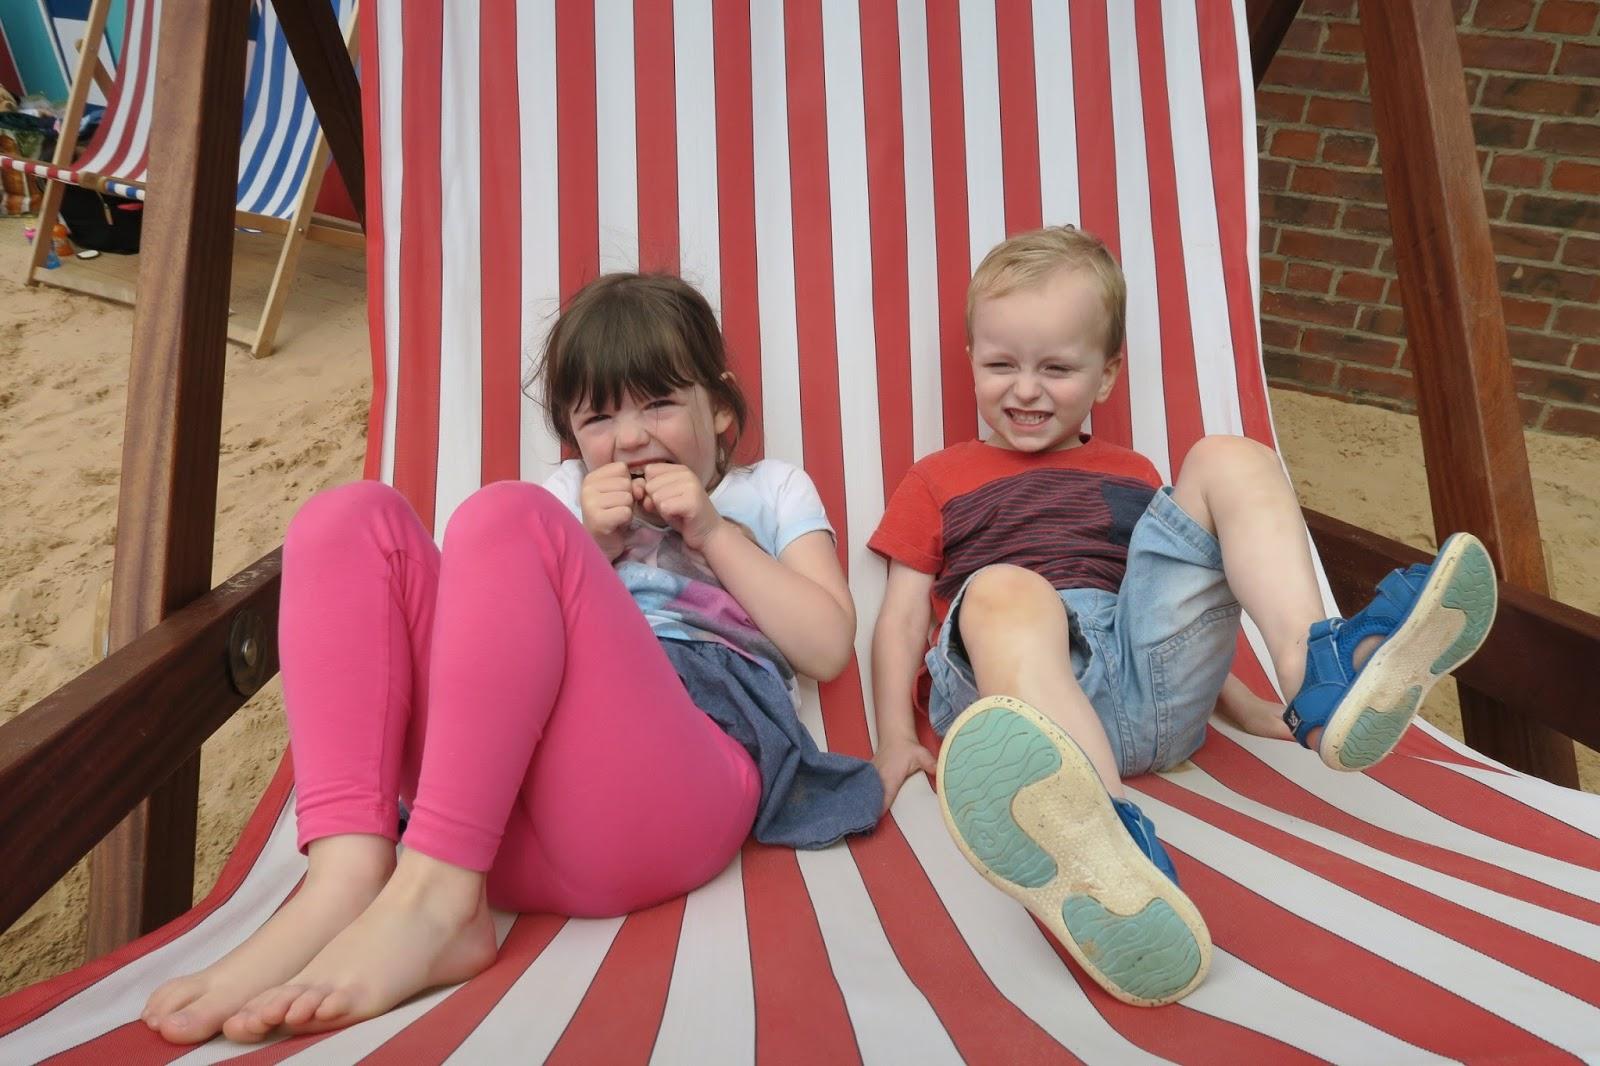 Preston Park Museum | Teddy Bears Picnic - A Review - beach deckchairs